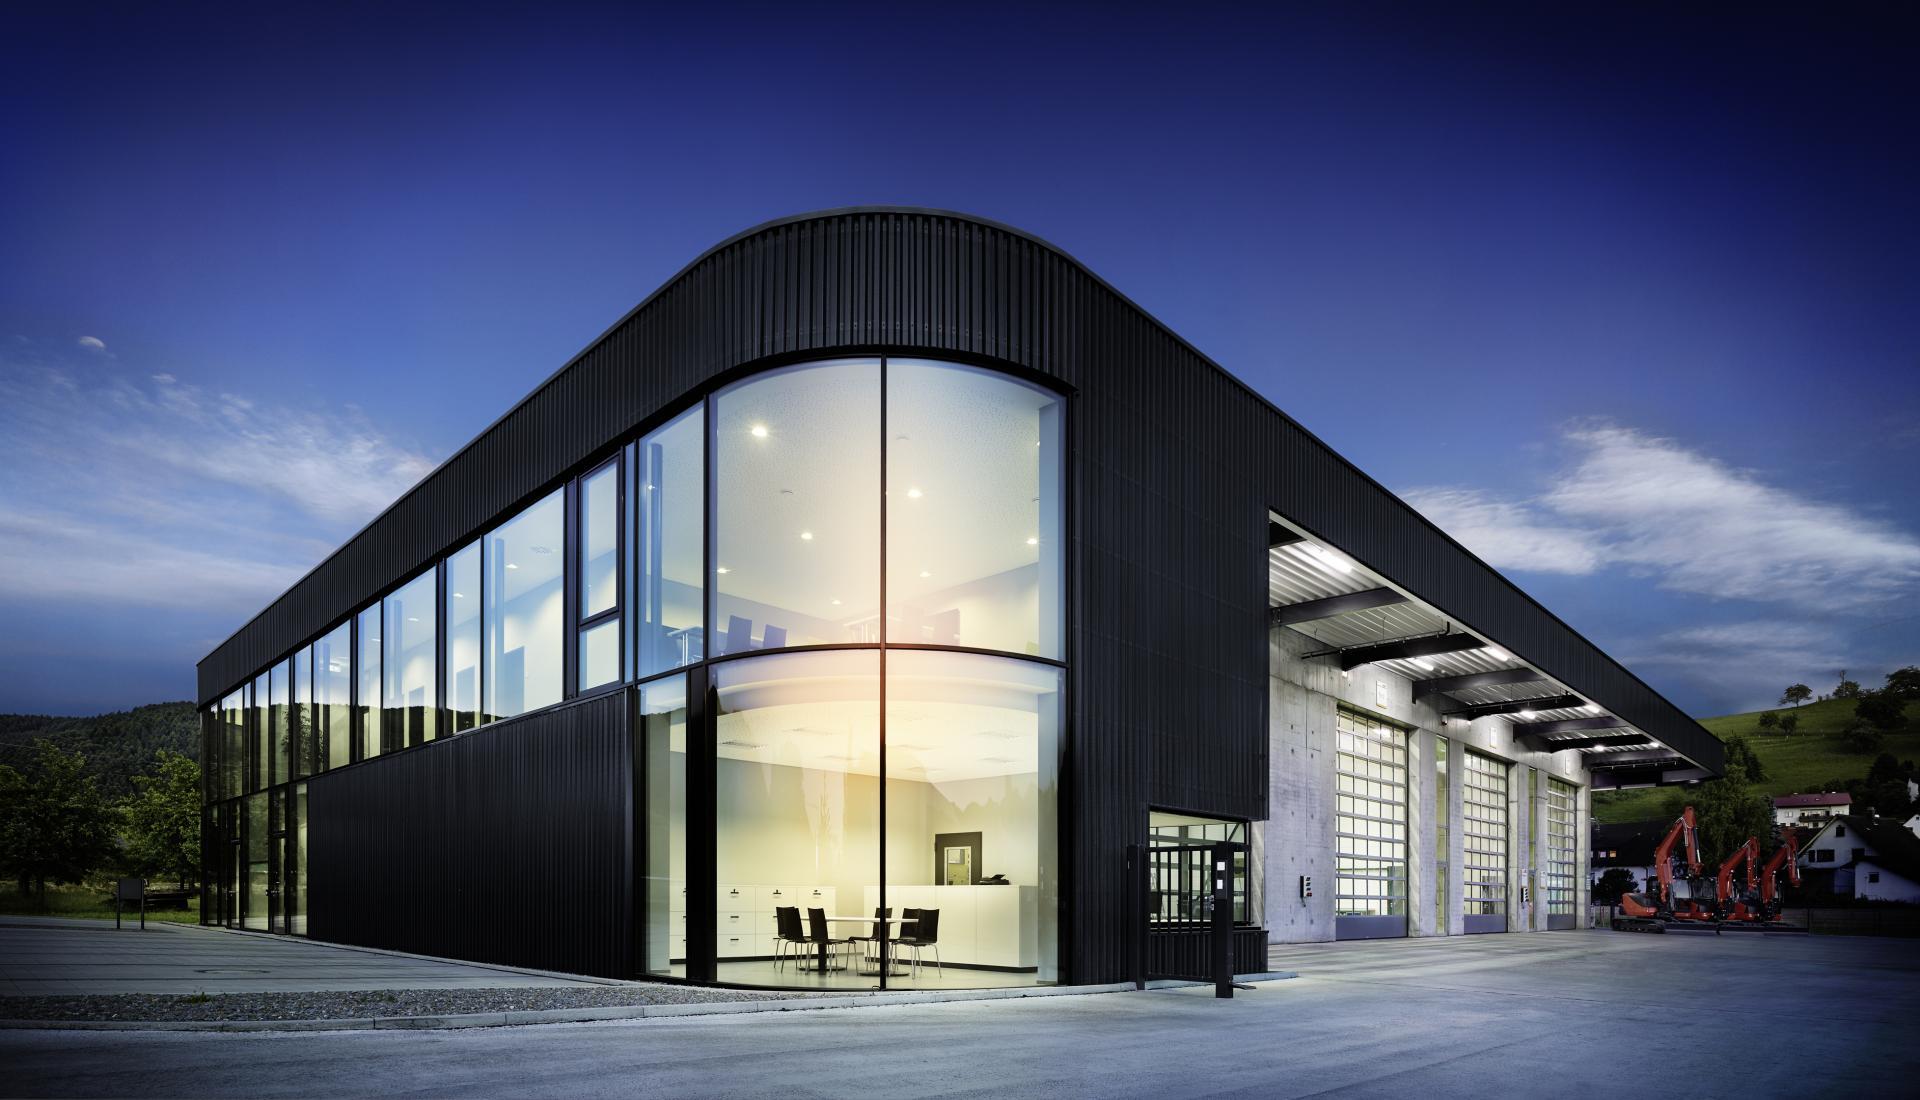 hoch schmelzle partner mbb architekten bda. Black Bedroom Furniture Sets. Home Design Ideas